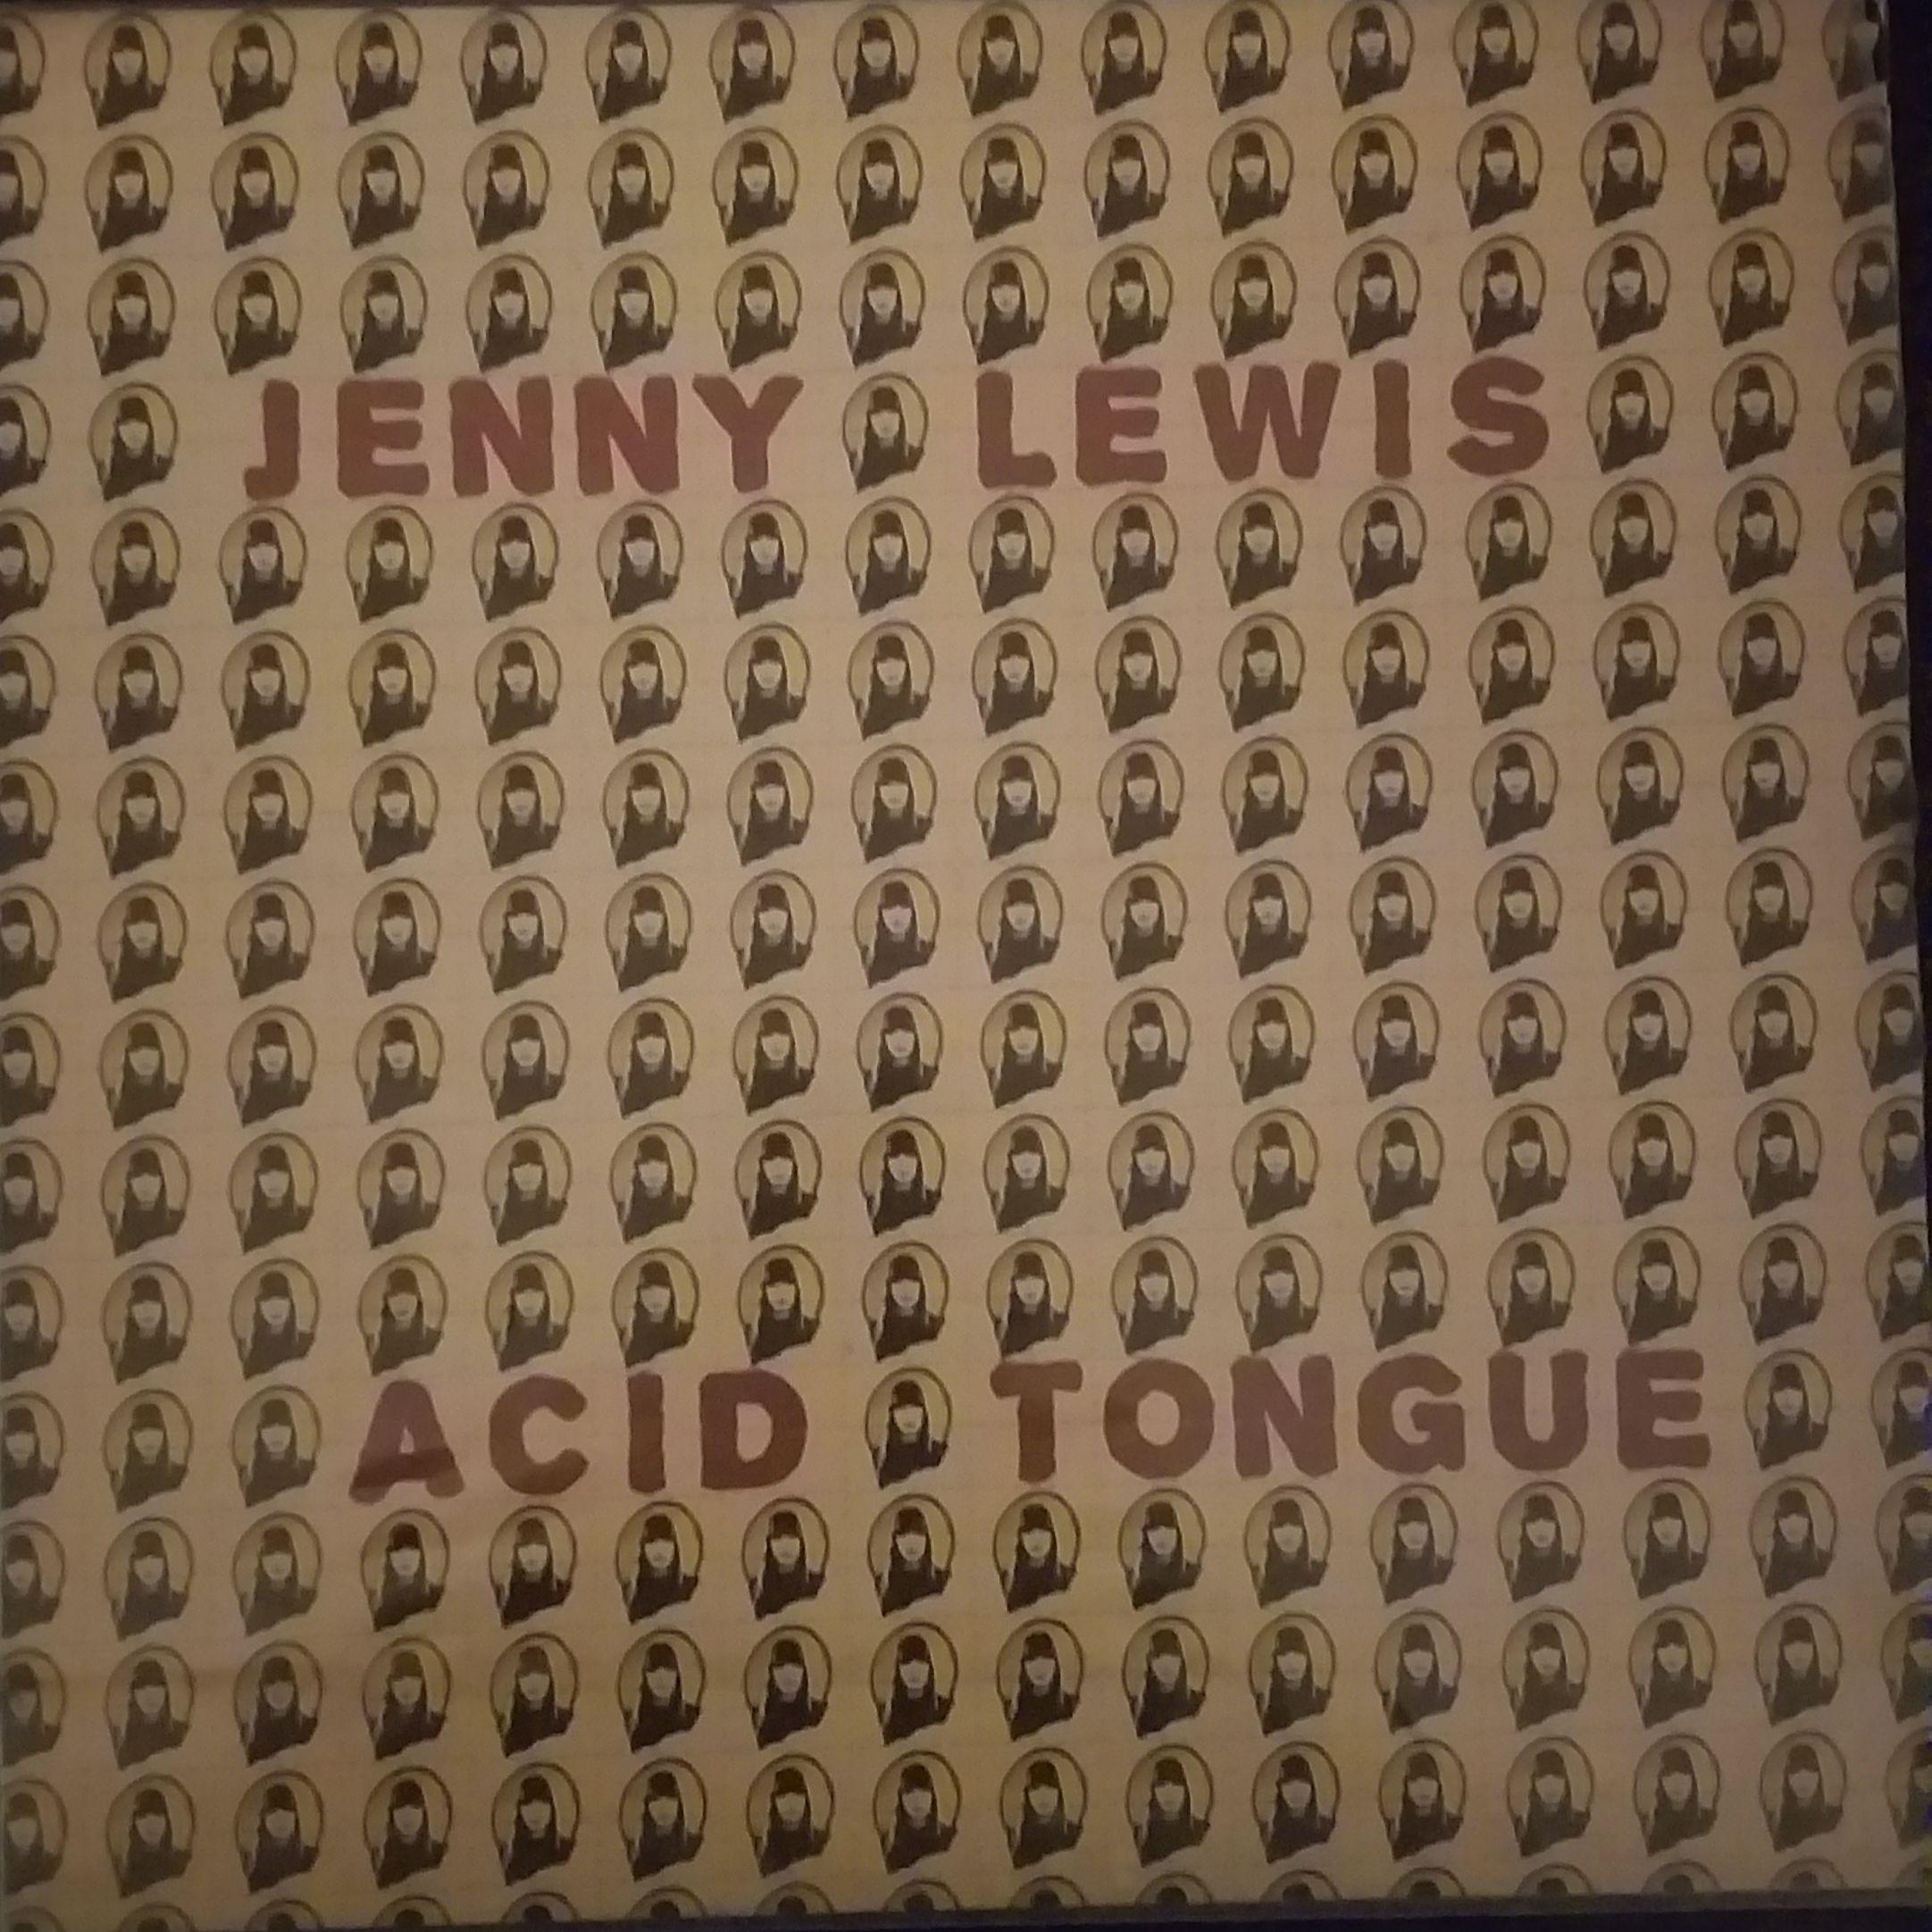 Jenny Lewis Acid tongue LP undefined